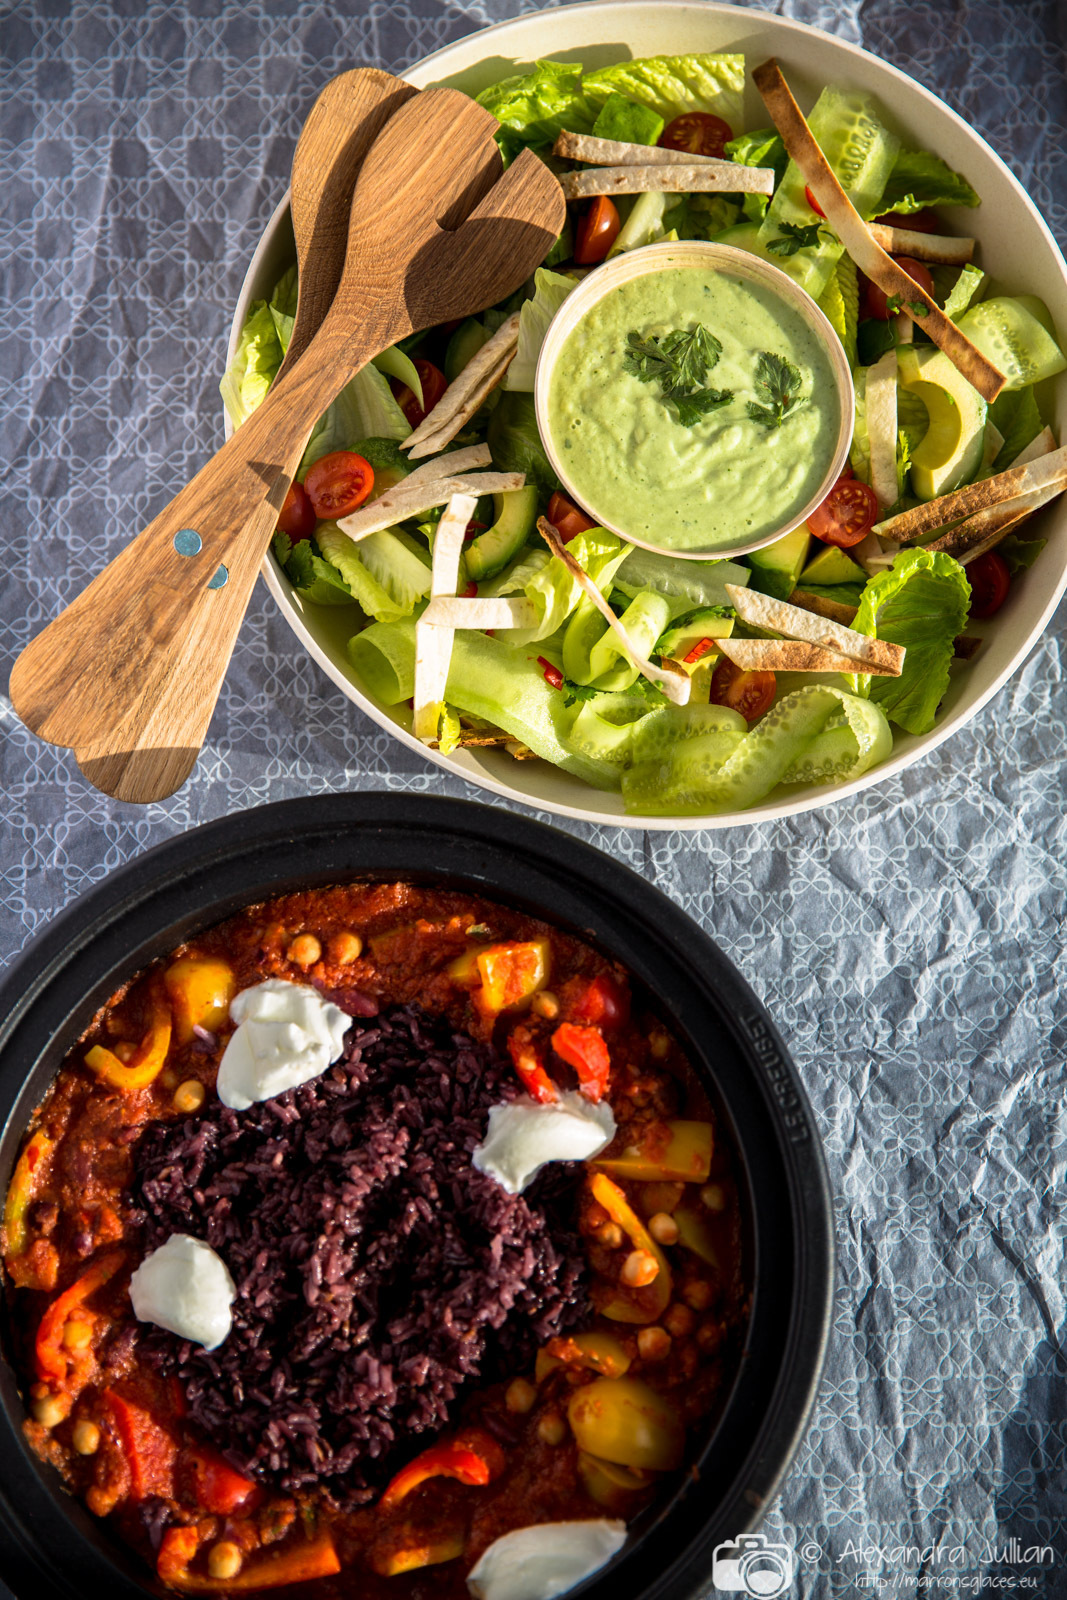 Chili végétarien, salade de tortillas croquantes et avocat